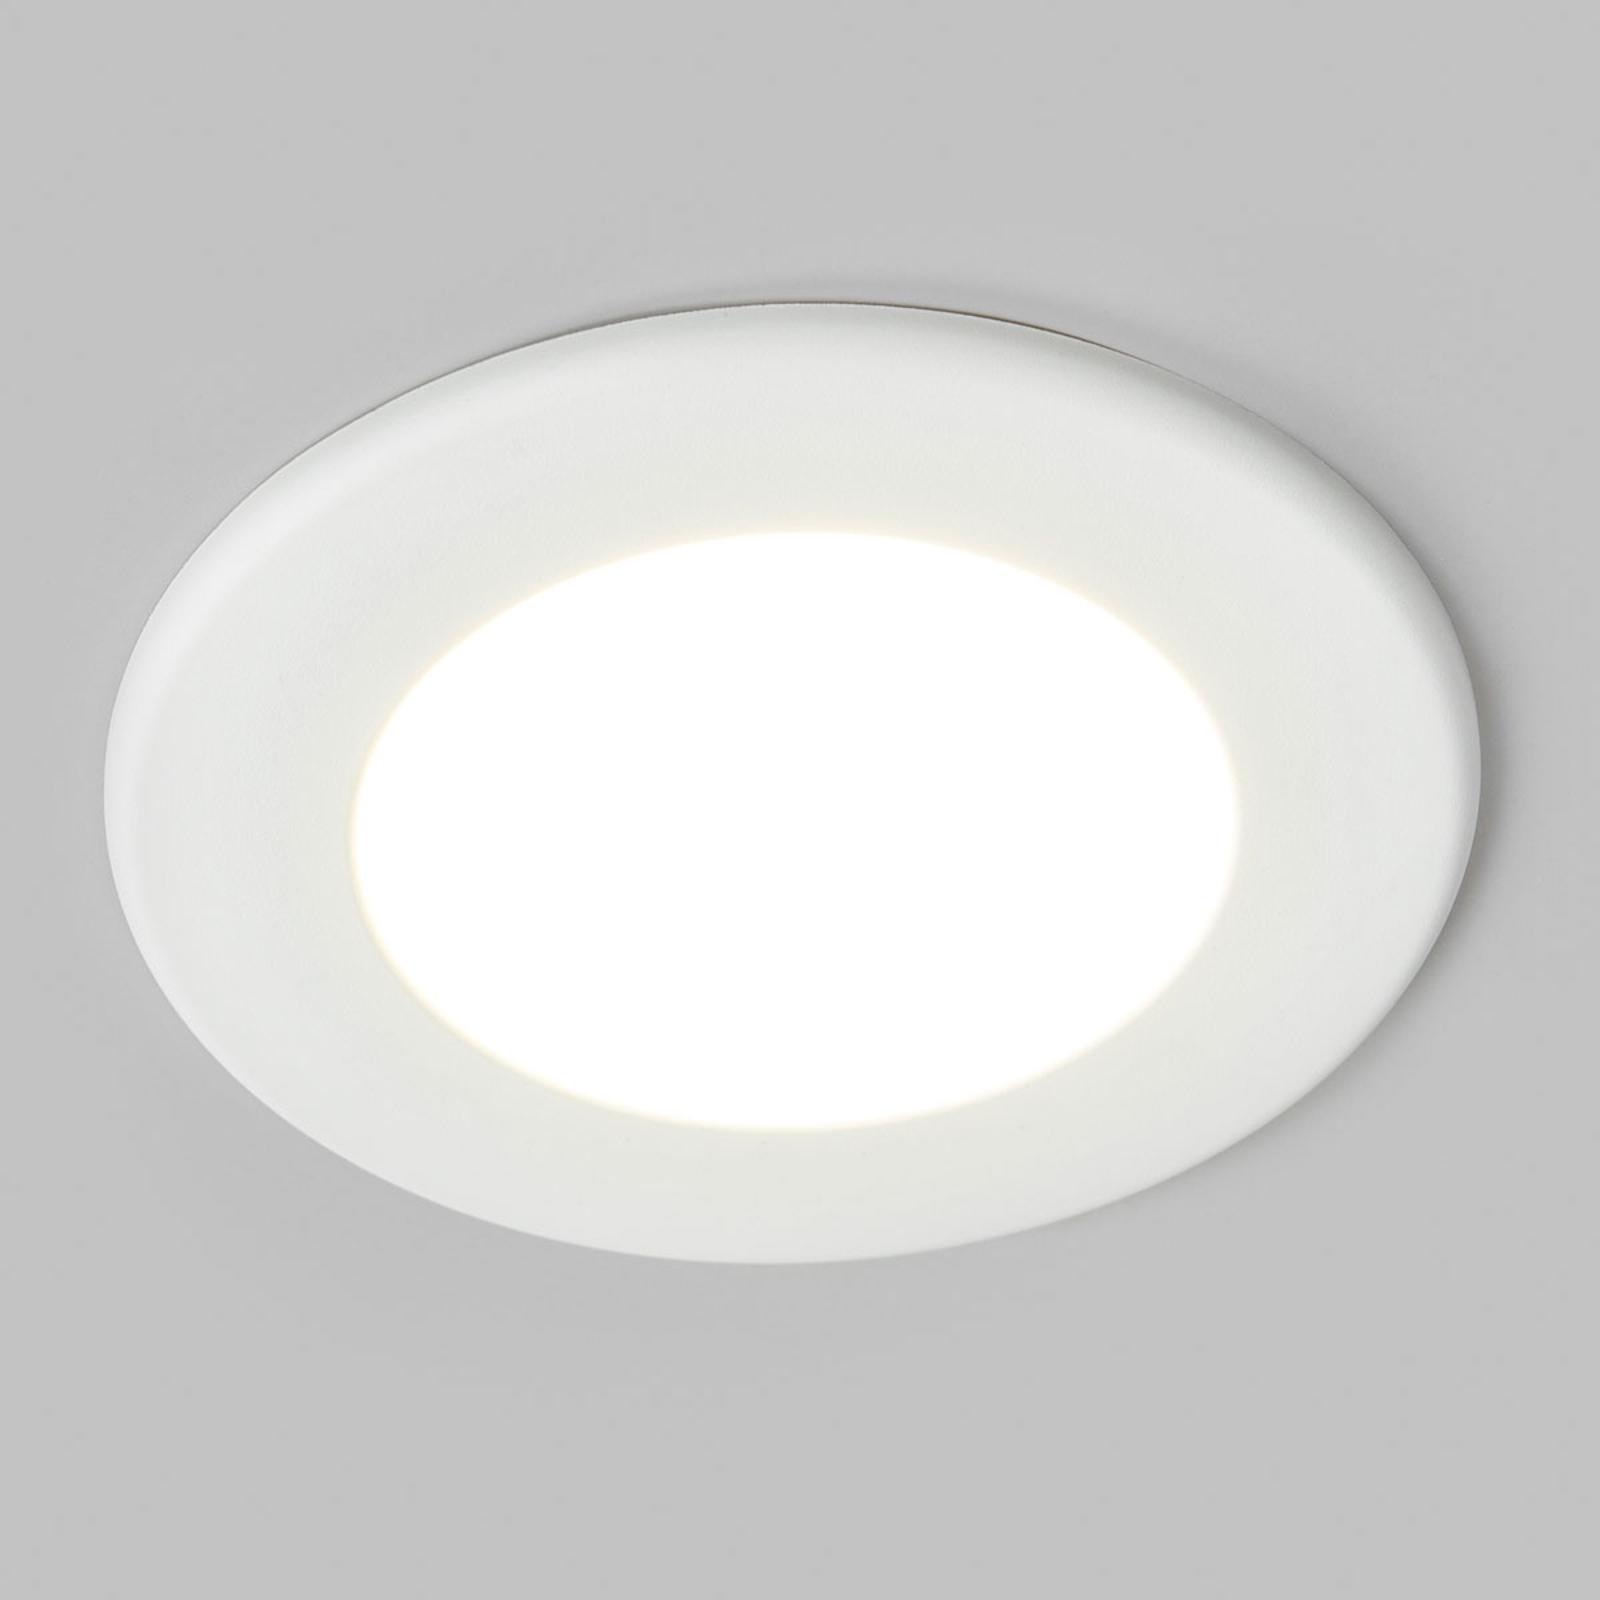 LED-indbygningsspot Joki hvid 4000K rund 11,5cm